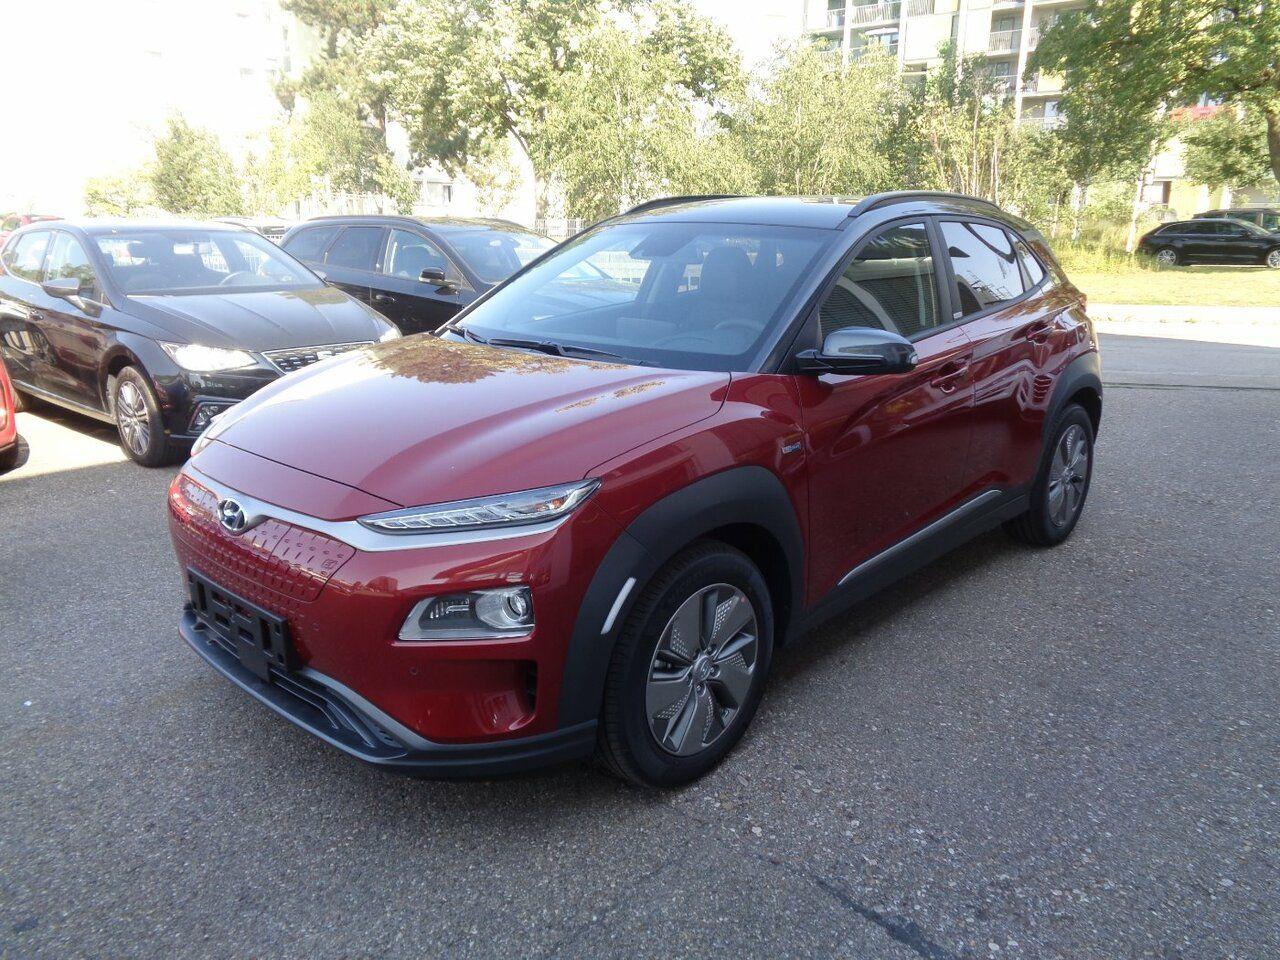 [Leasingtime Privatleasing und Gewerbe] Hyundai Kona Premium 204PS/64kWh -> 149€ mtl. (24m/10.000 km) + 895€ Überführung, LF 0,29, GLF 0,36